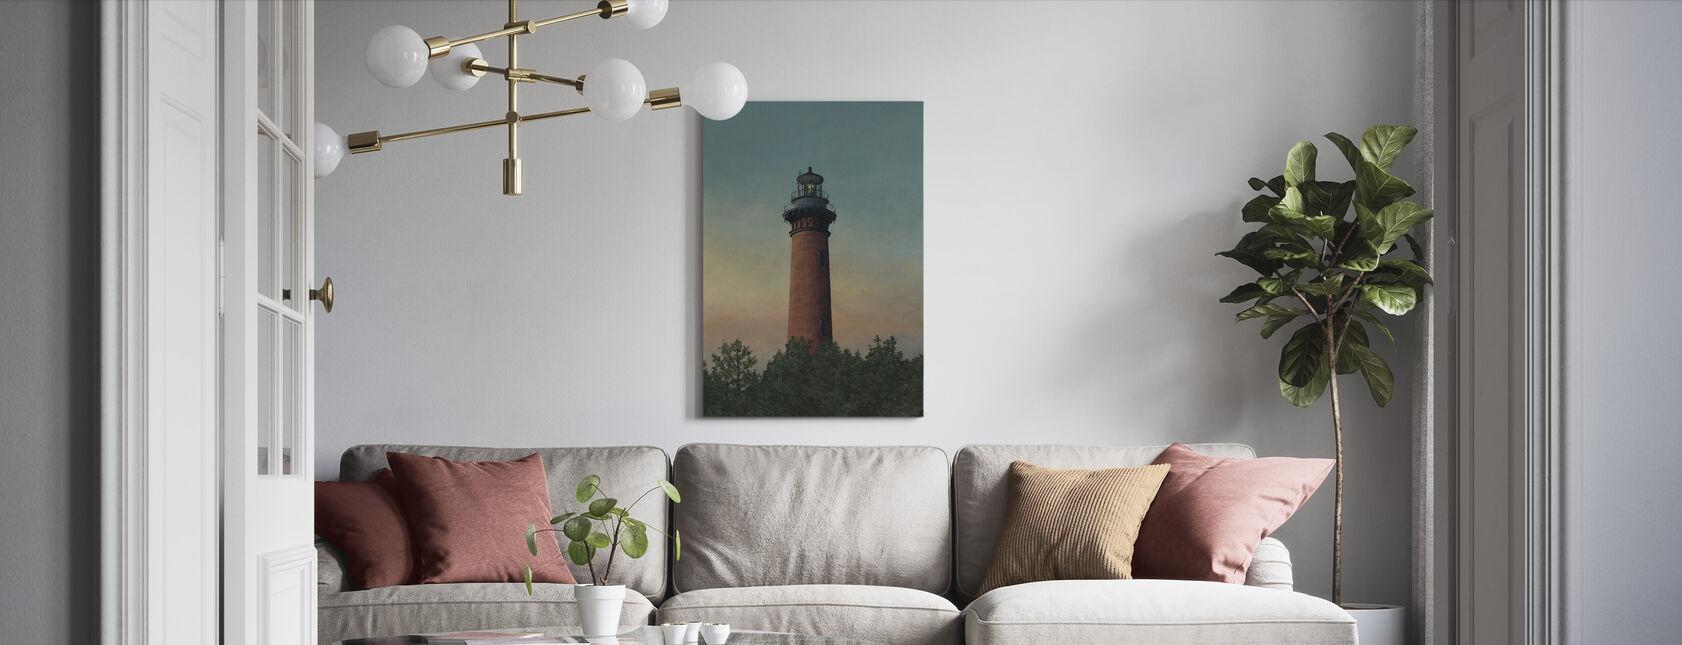 Currituck Beach Lighthouse - Canvas print - Living Room